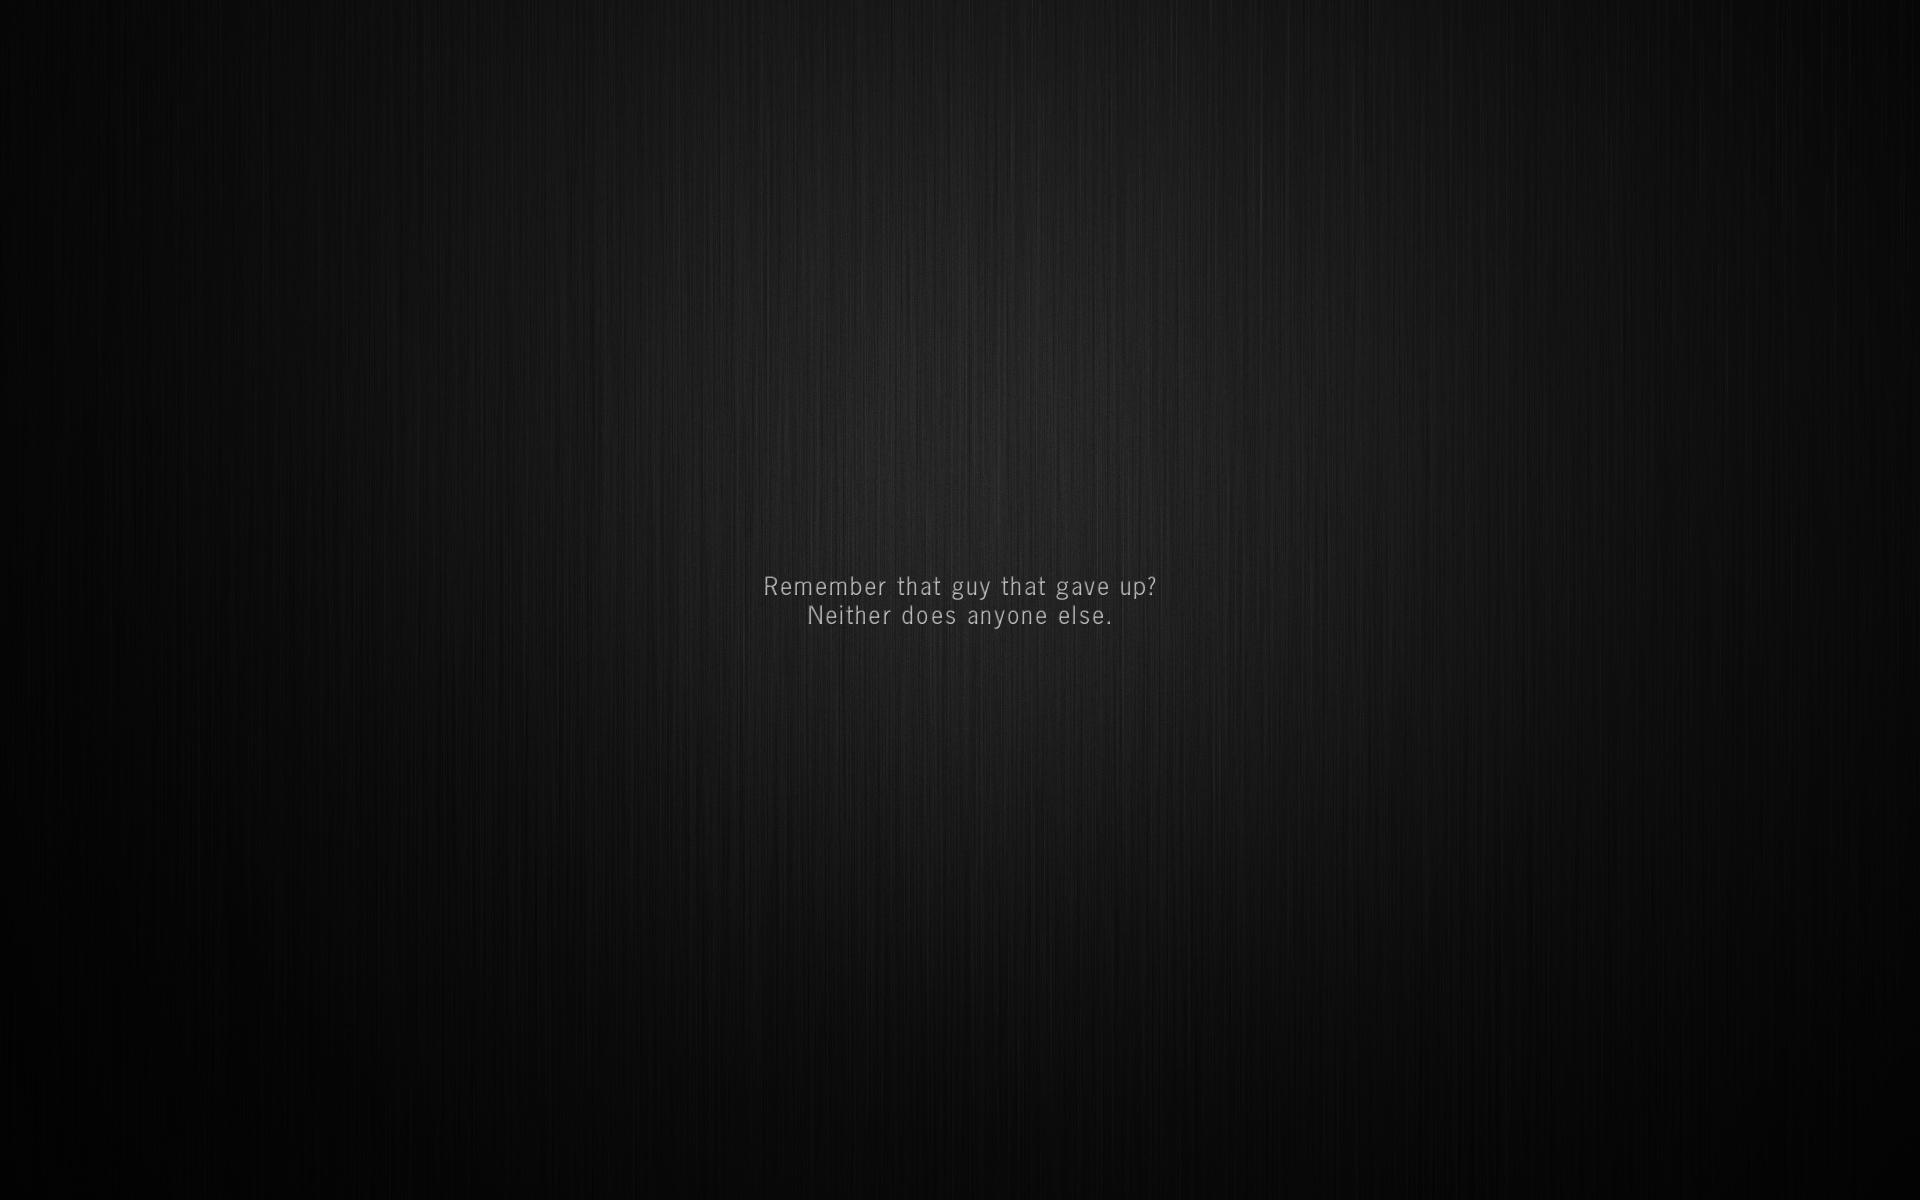 Inspirational Quotes Motivational Wallpaper QuotesGram 1920x1200